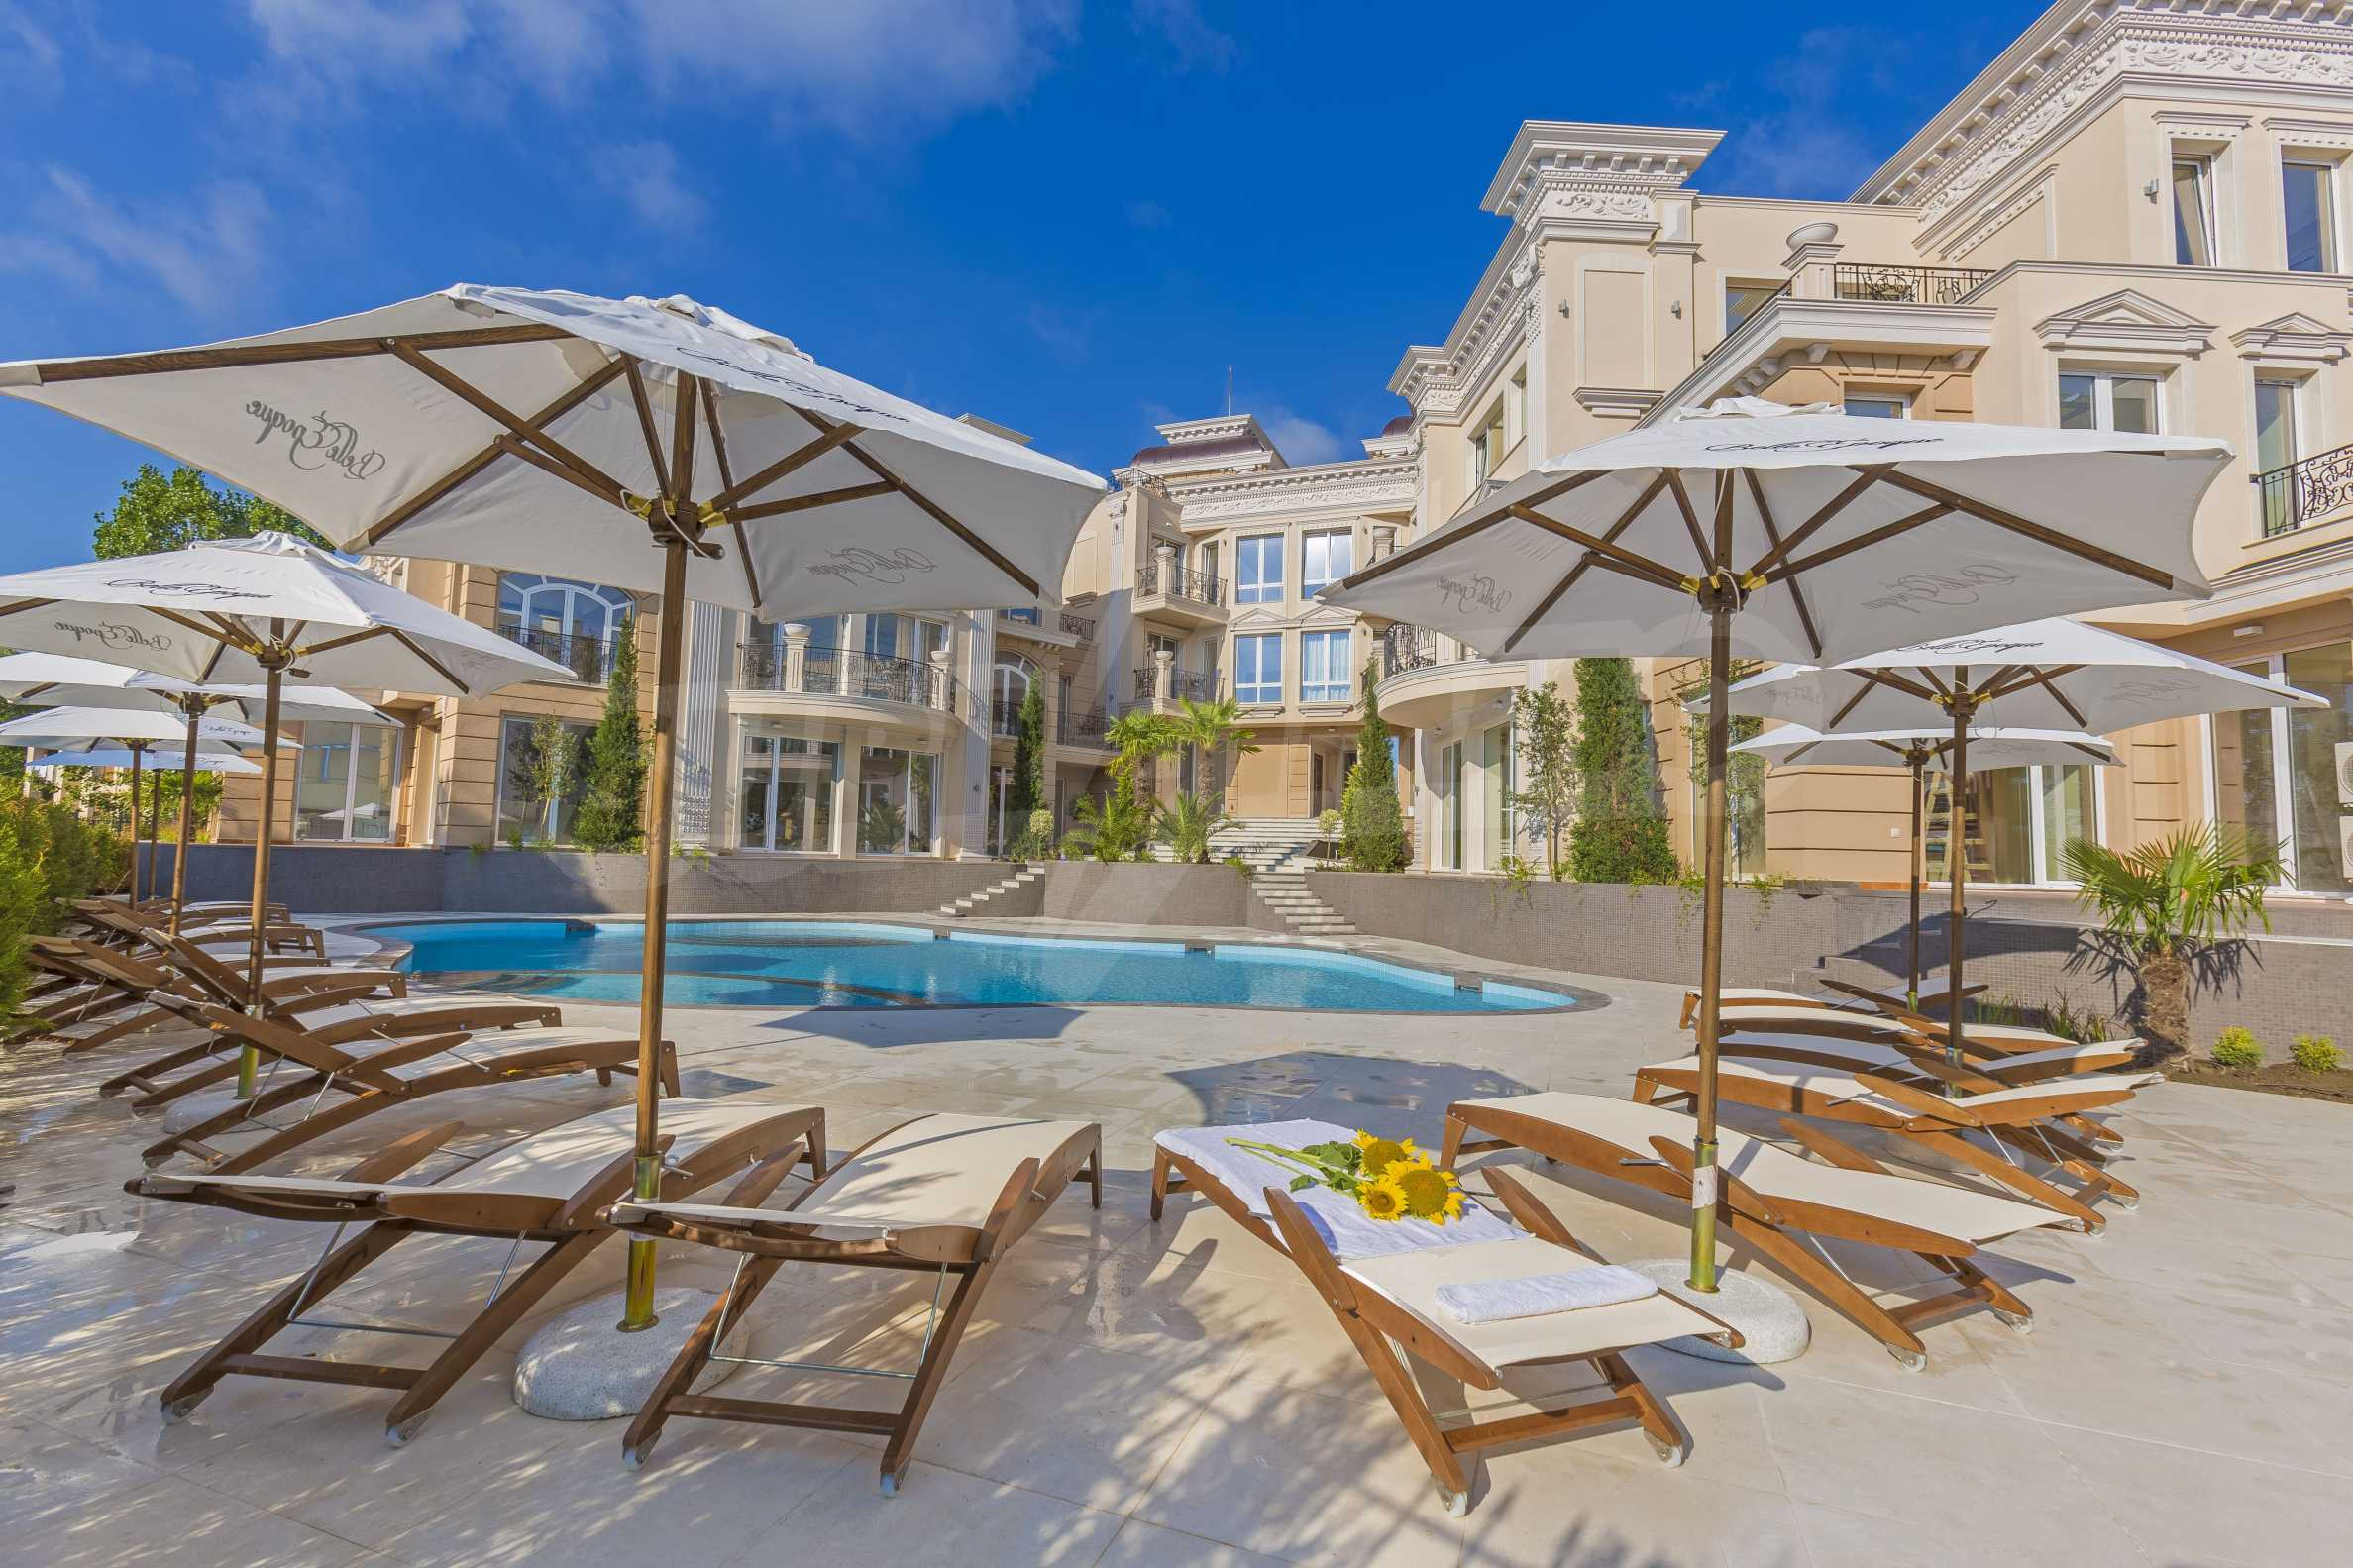 Дизайнерски тристаен апартамент под наем за летен сезон в резиденция Belle Époque в Лозенец 39